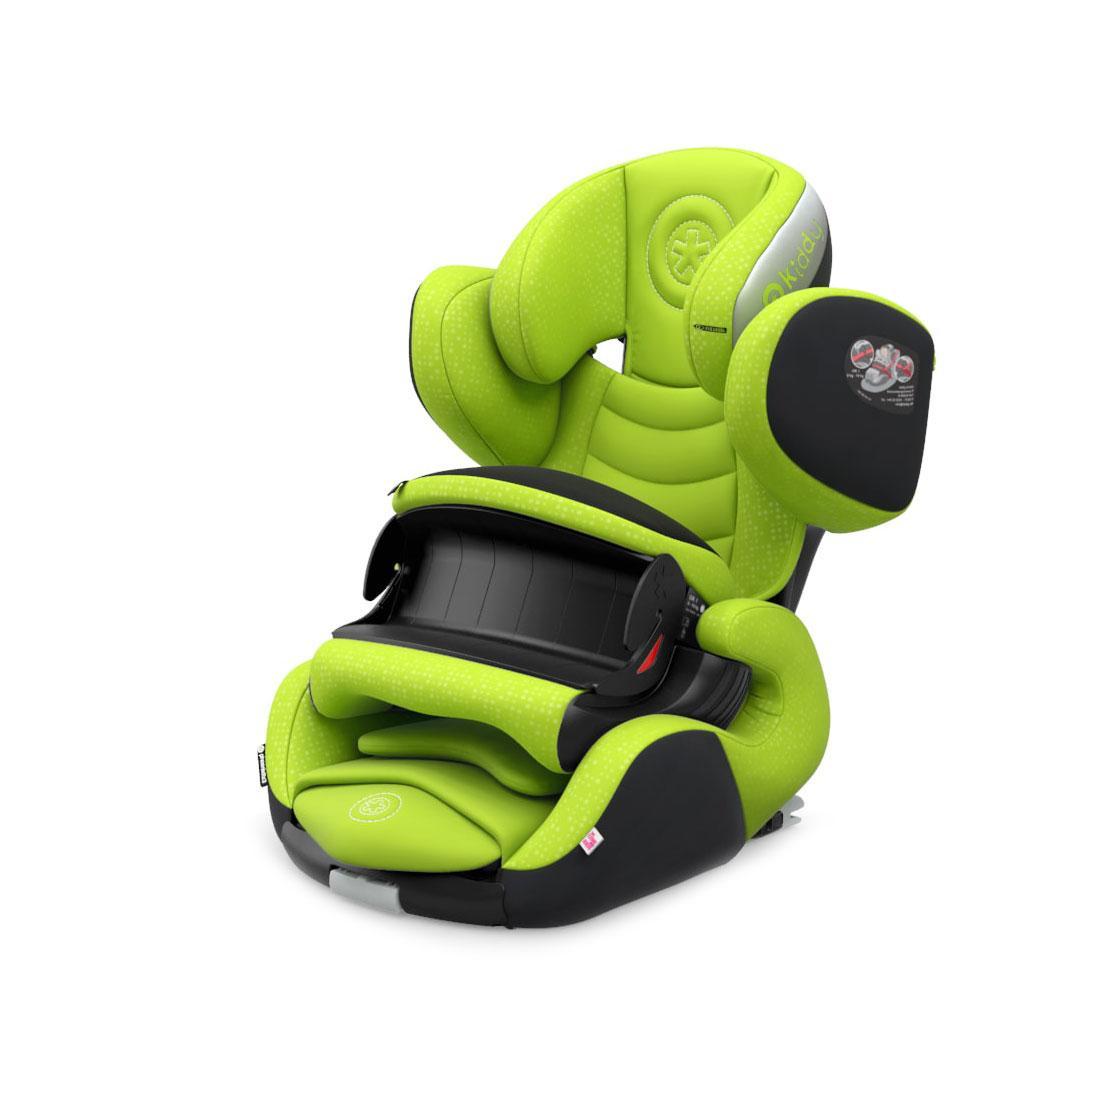 Автокресло Phoenixfix 3, Lime Green «Kiddy» (41543PF097)